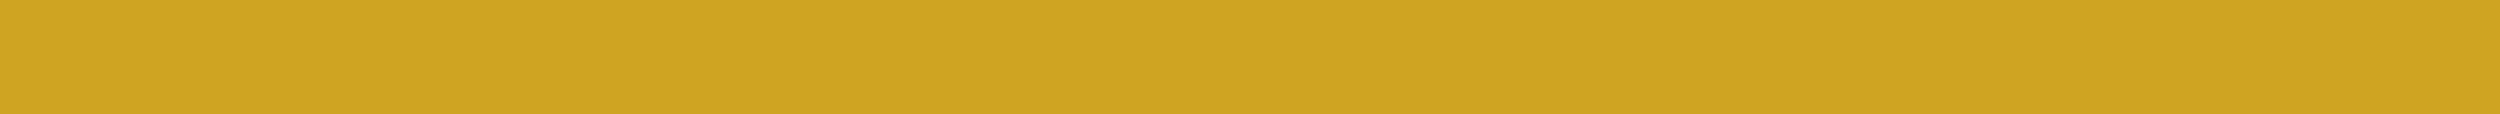 strip GOLD.jpg